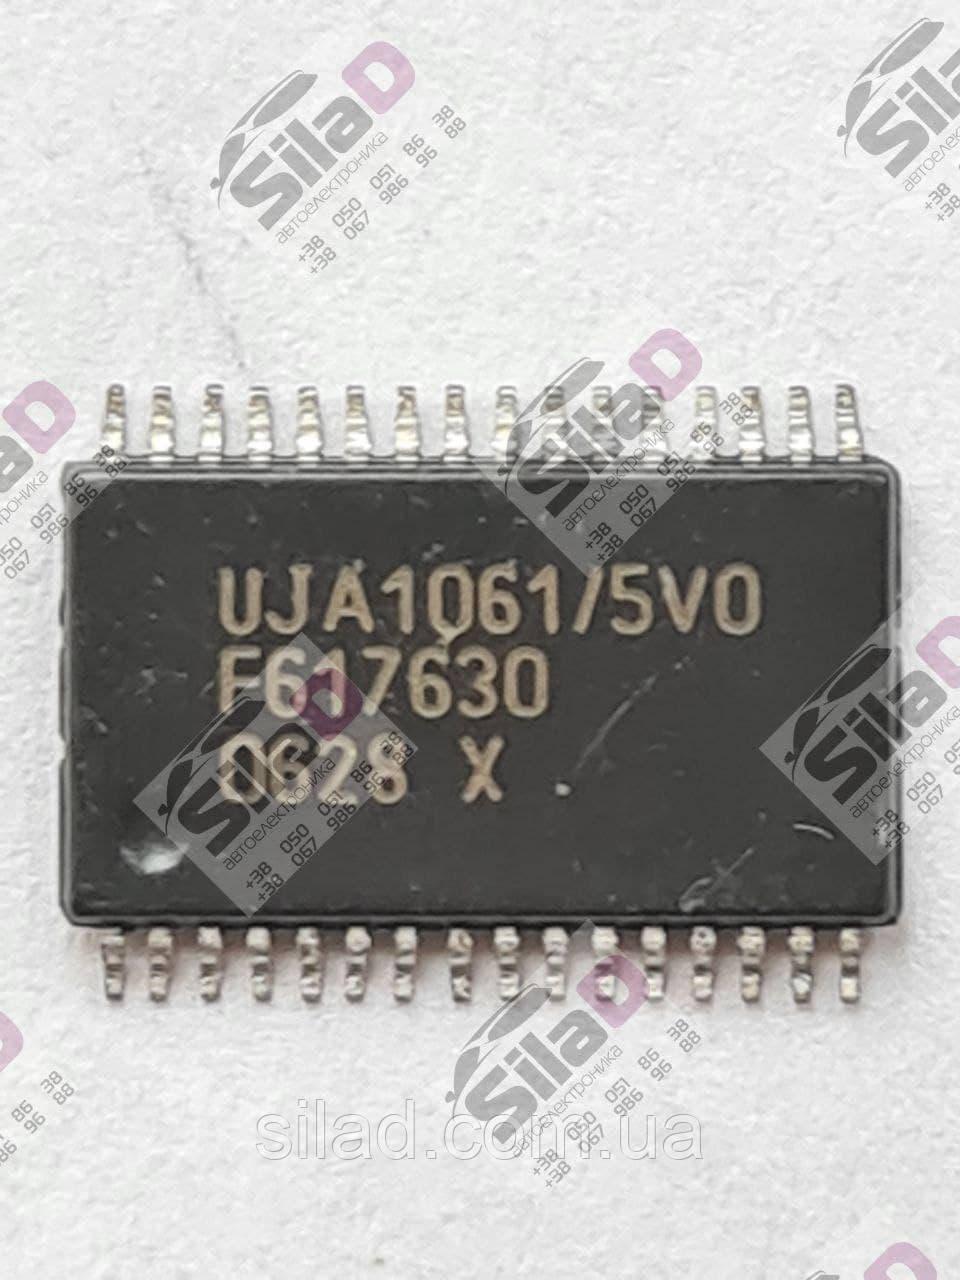 Микросхема UJA1061 5V0 NXP корпус HTSSOP32